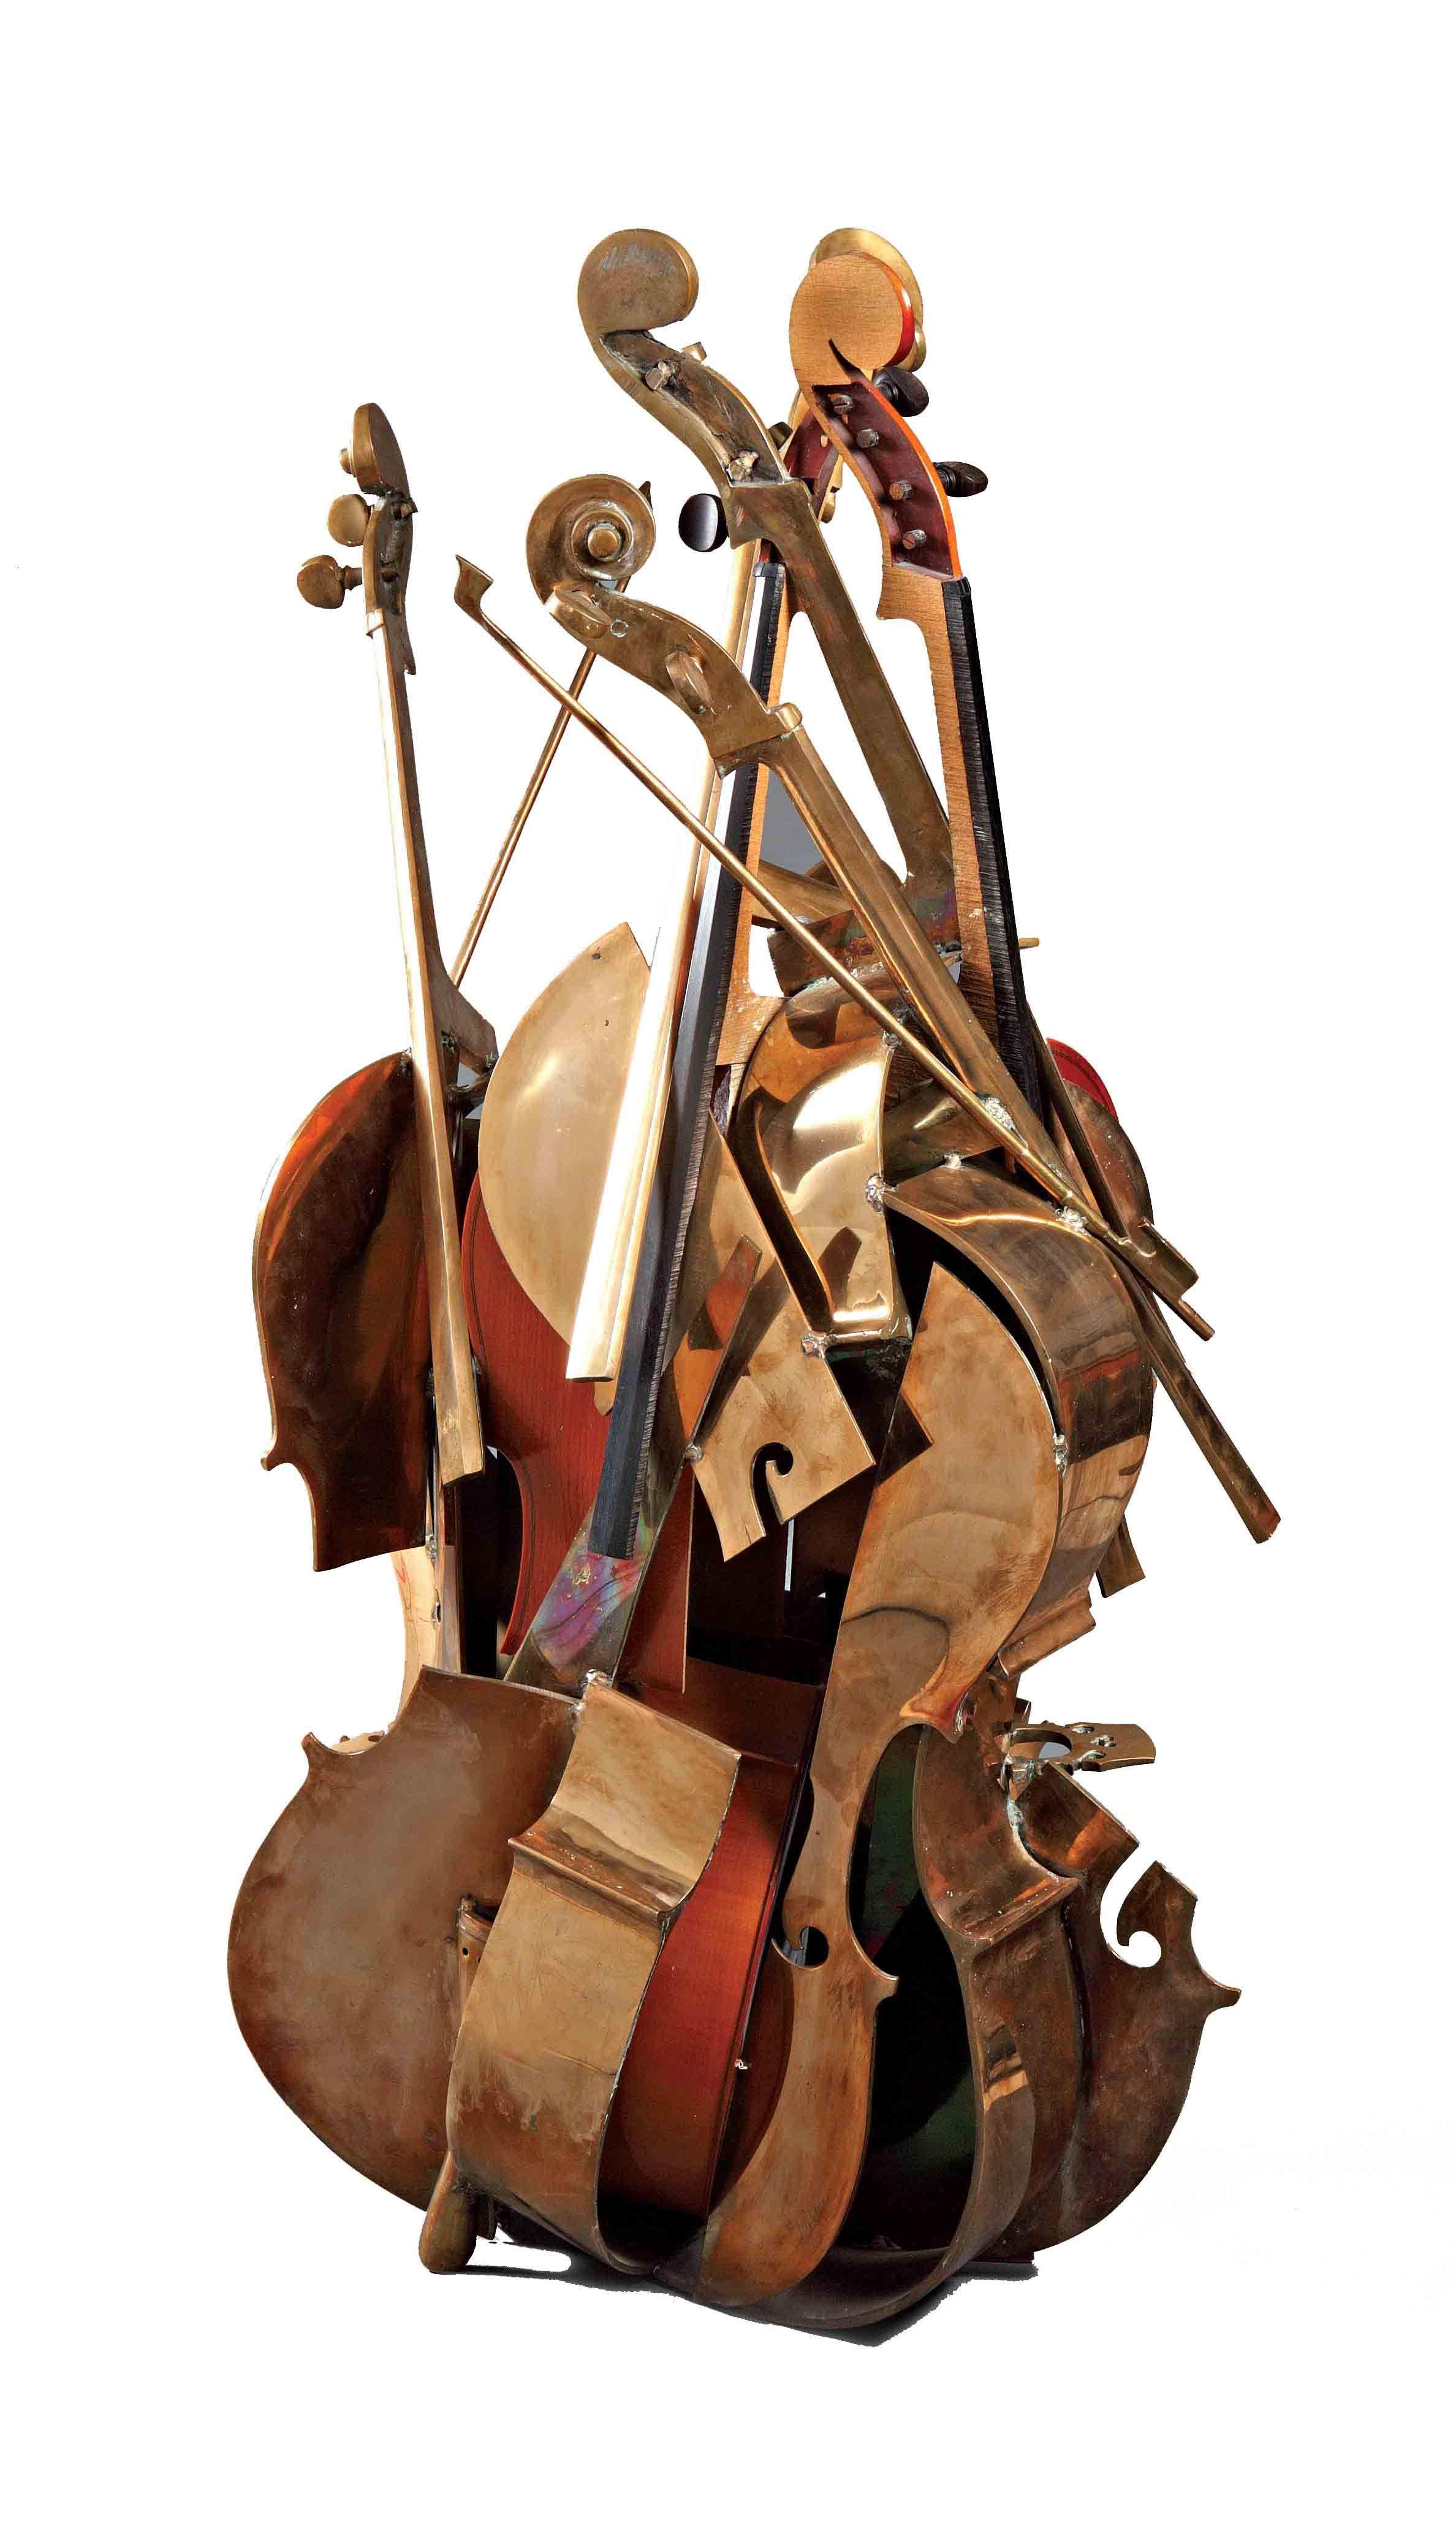 Armand Pierre Fernandez Instruments art, Music sculpture